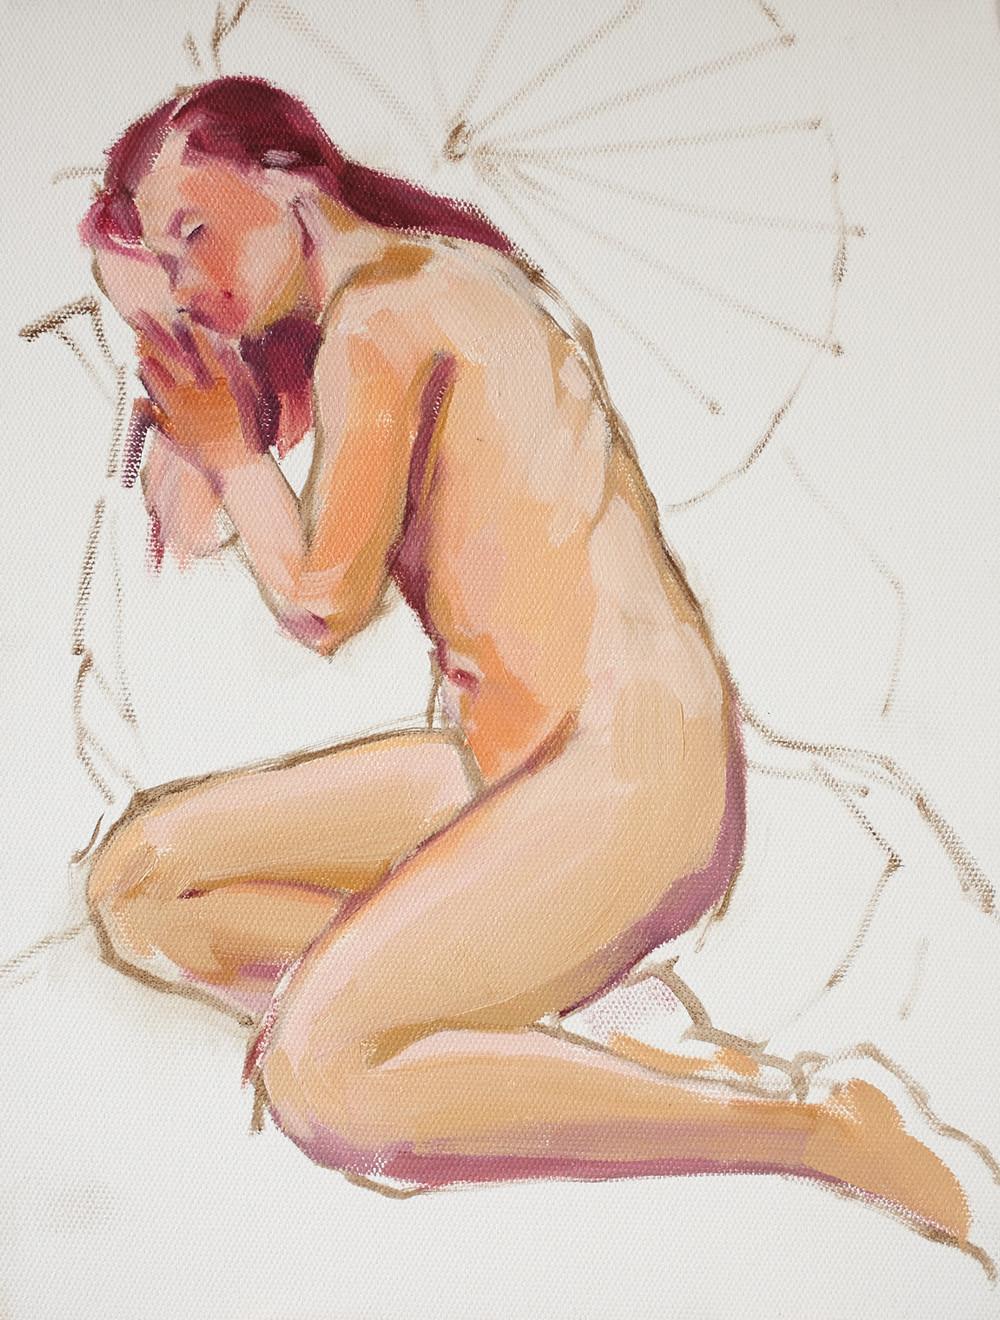 17Carolin_Figure_Painting.jpg